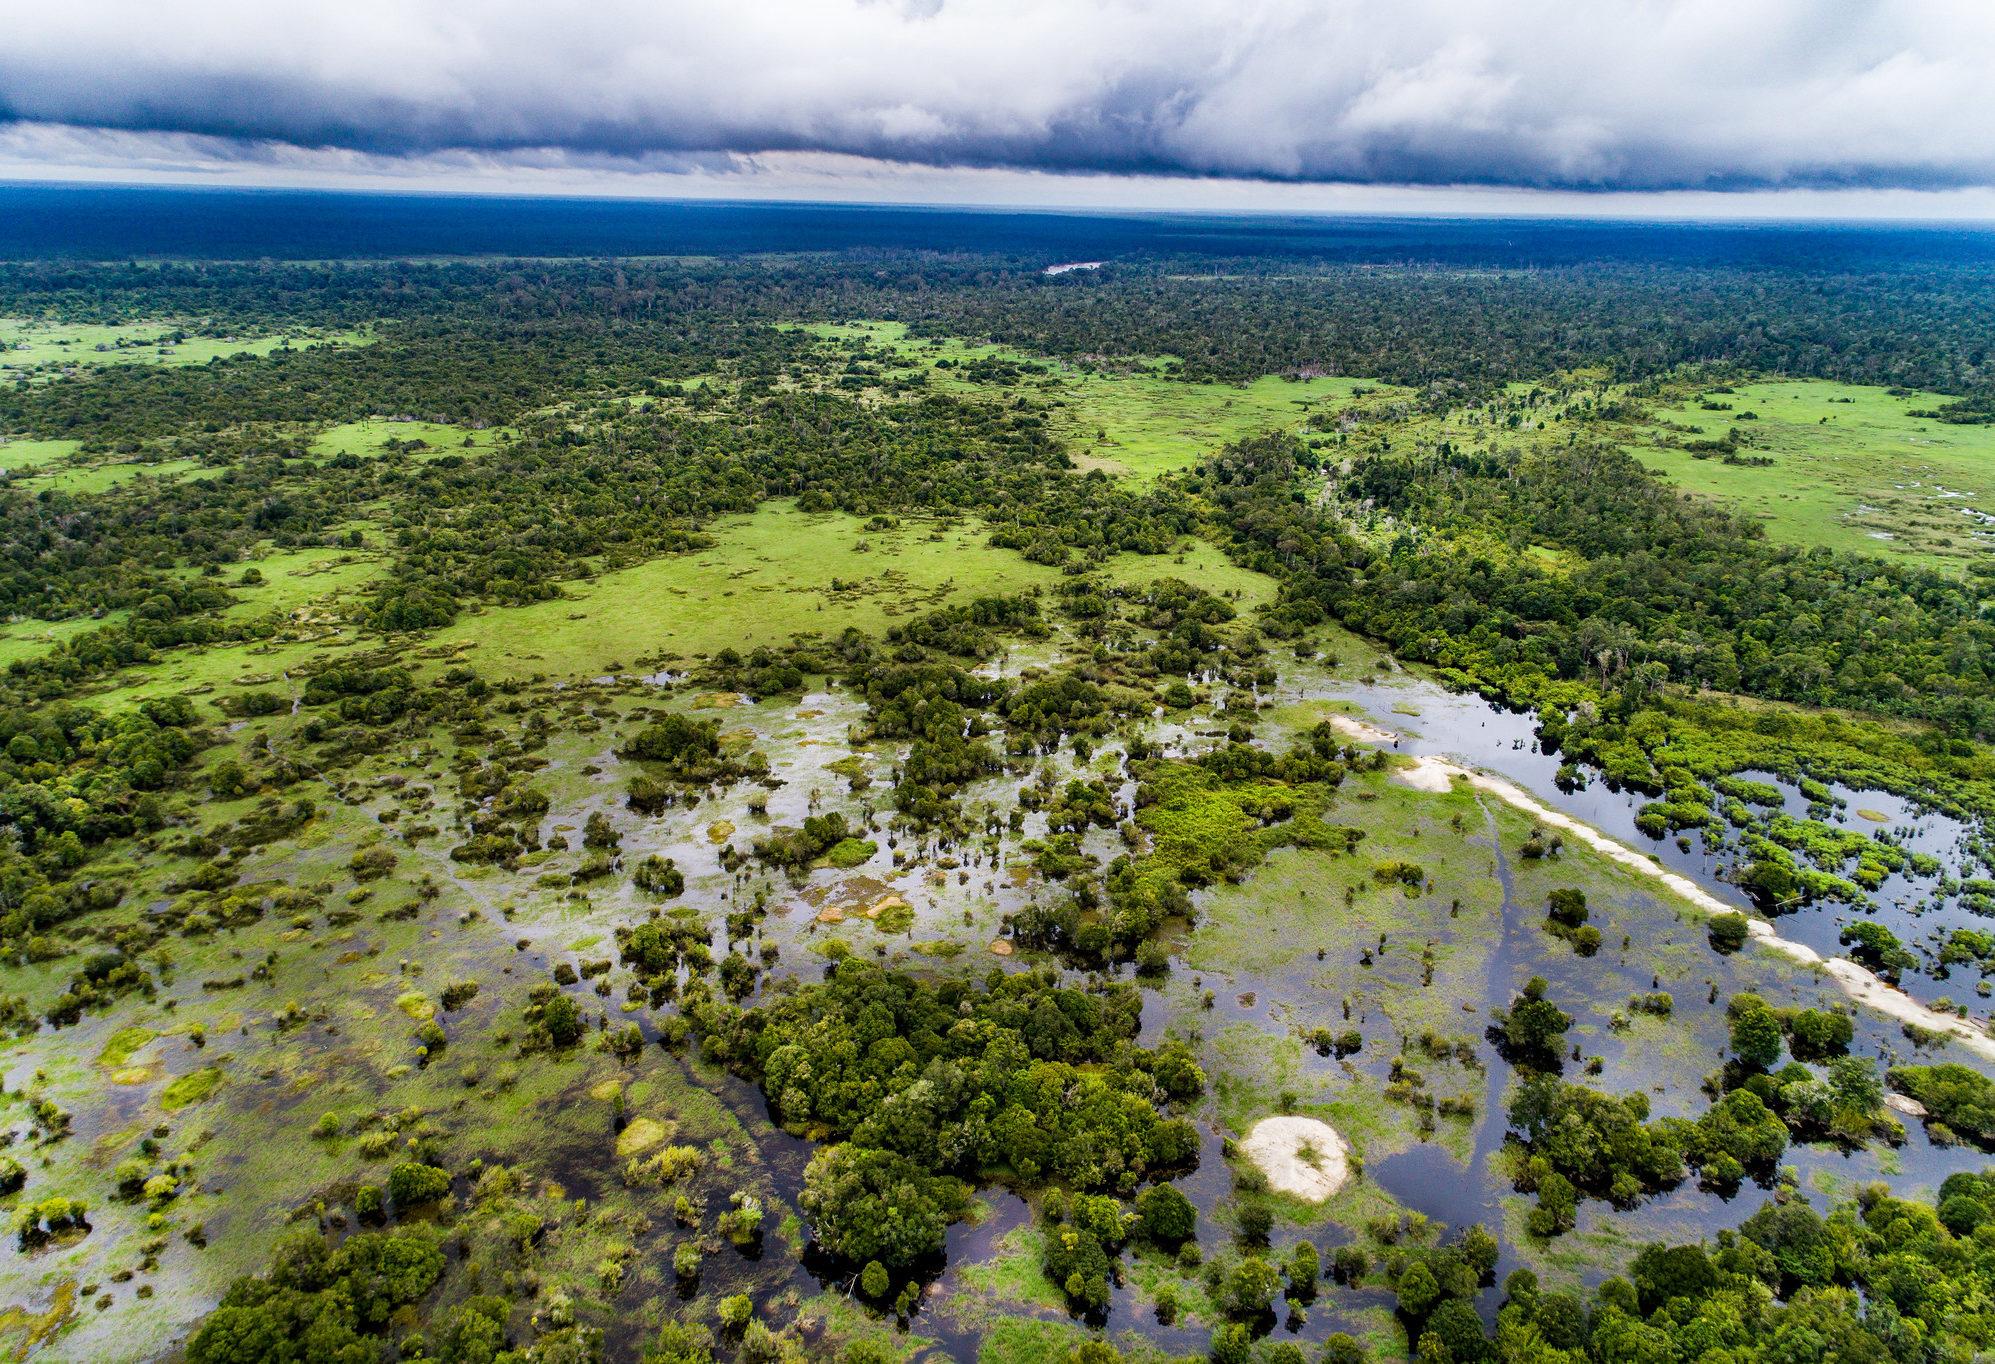 indonesia peatland soil carbon sequestration